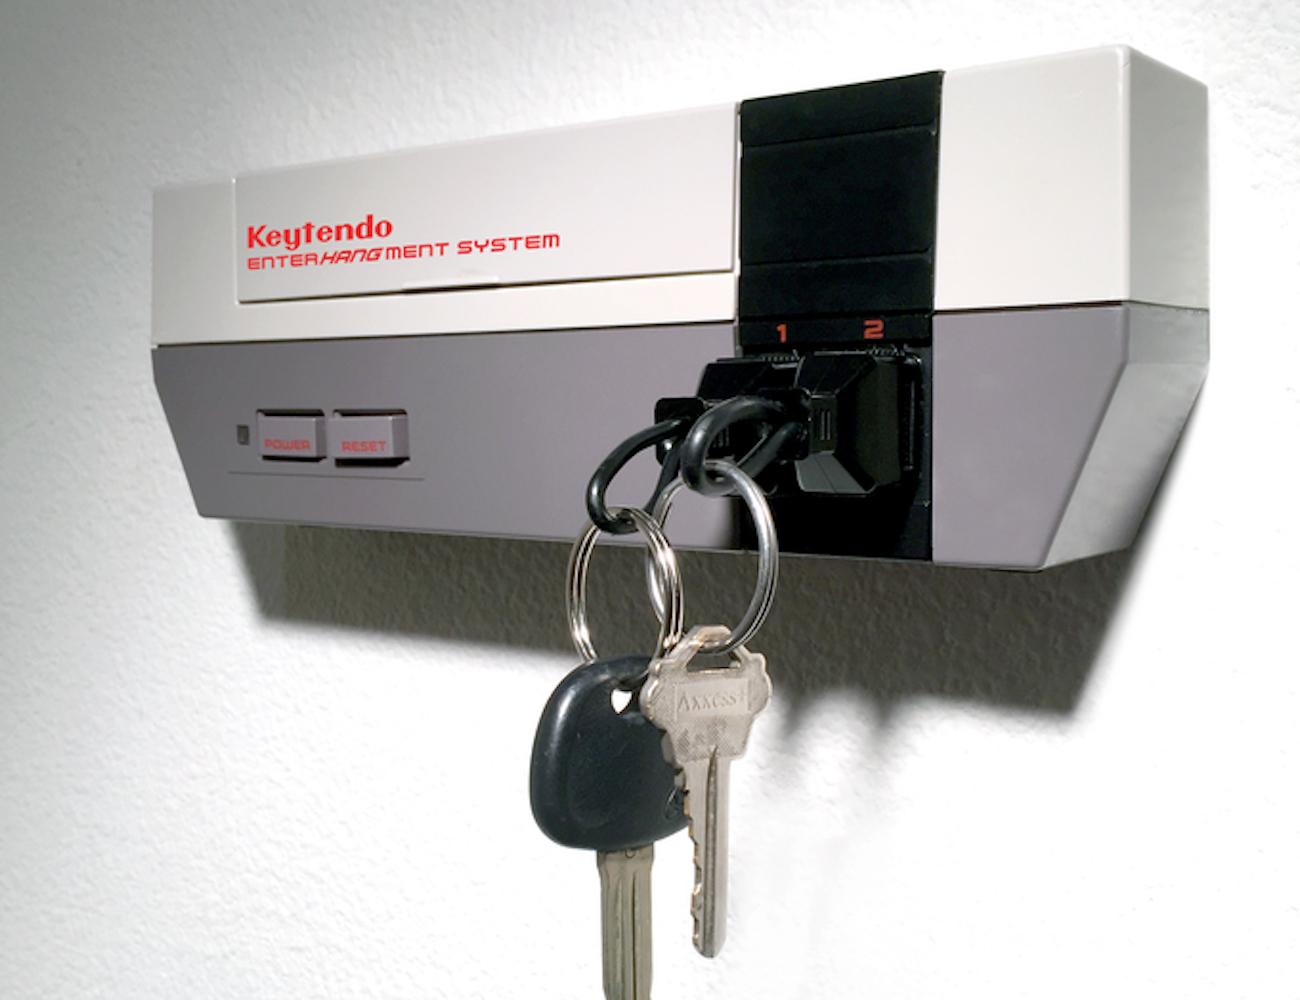 Keytendo Video Game Console Key Holder